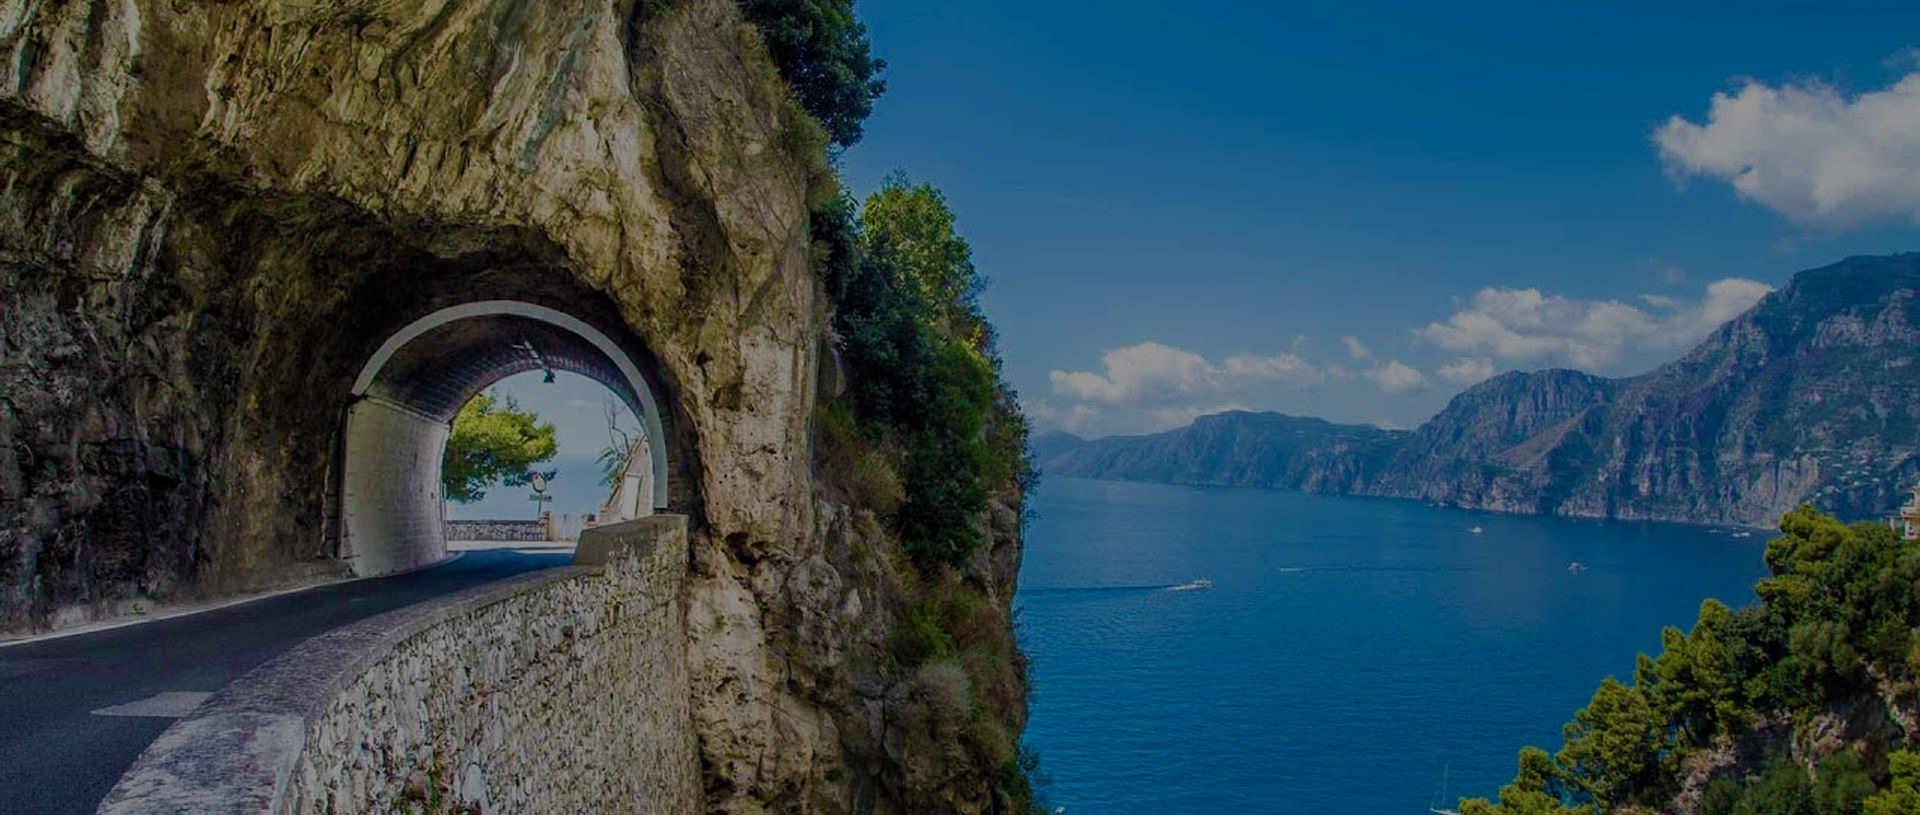 parlato tour amalfi coast